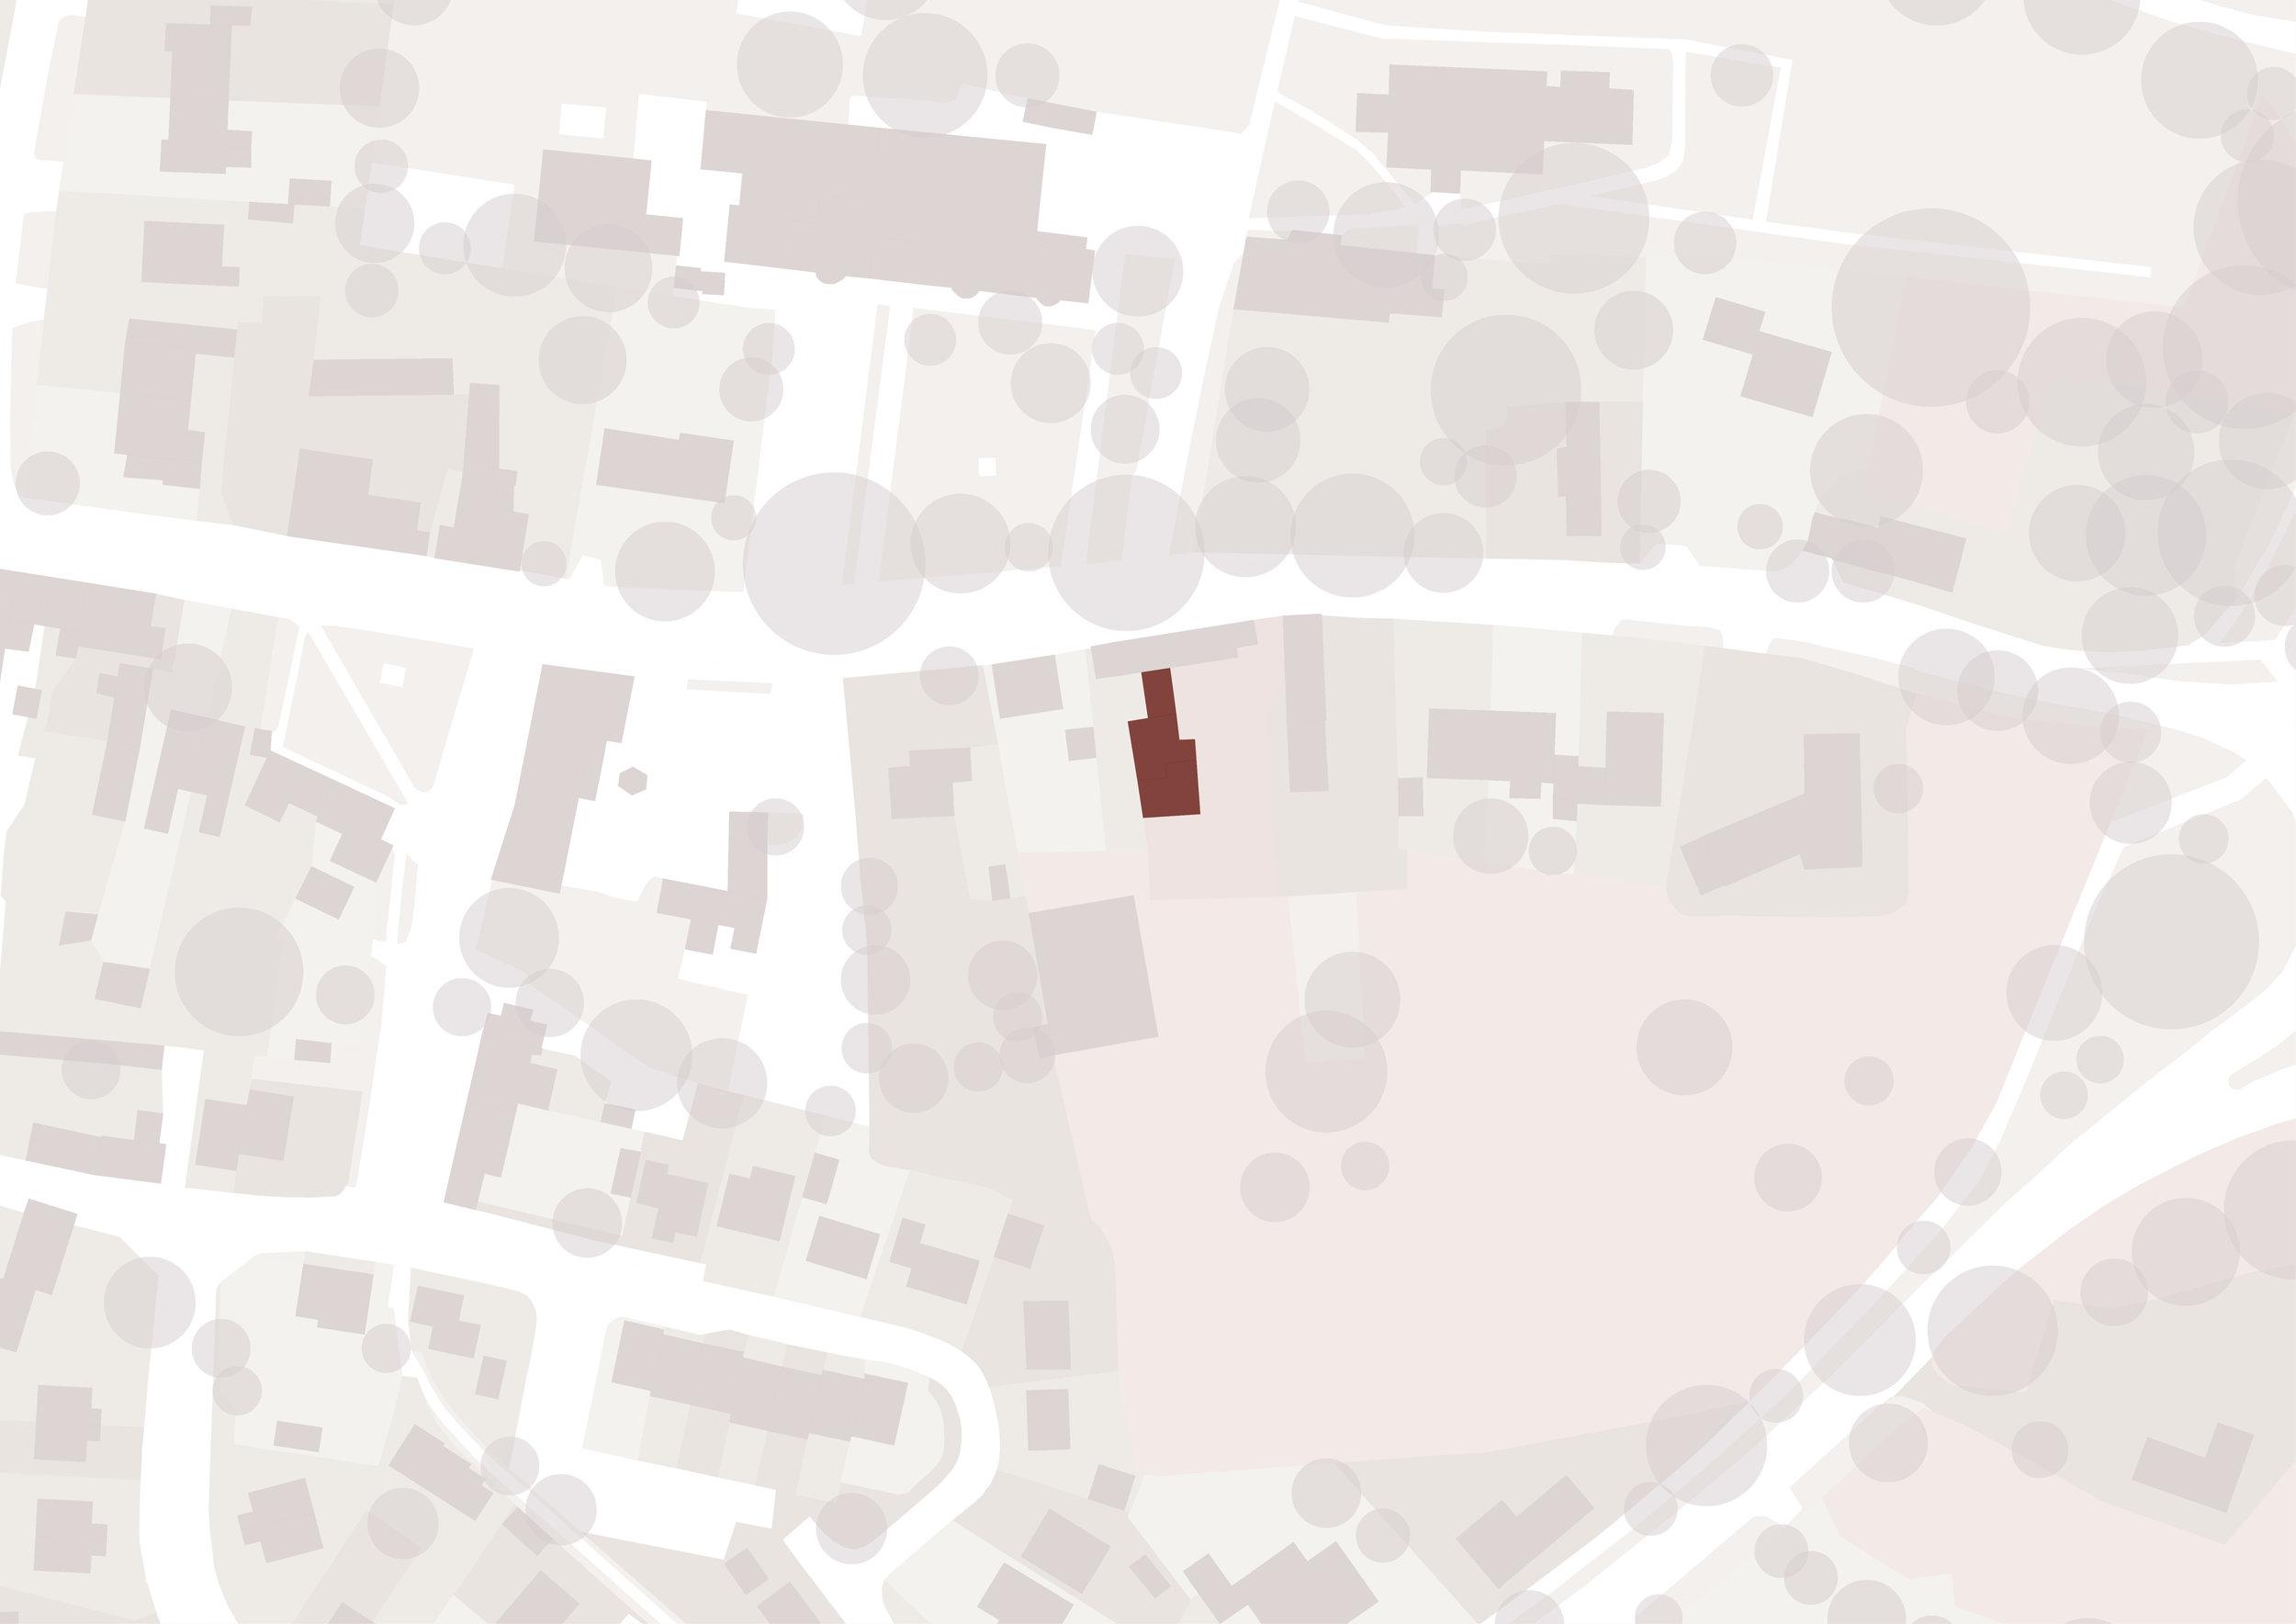 Village Farm Map - East Yorkshire Architects - Samuel Kendall Associates